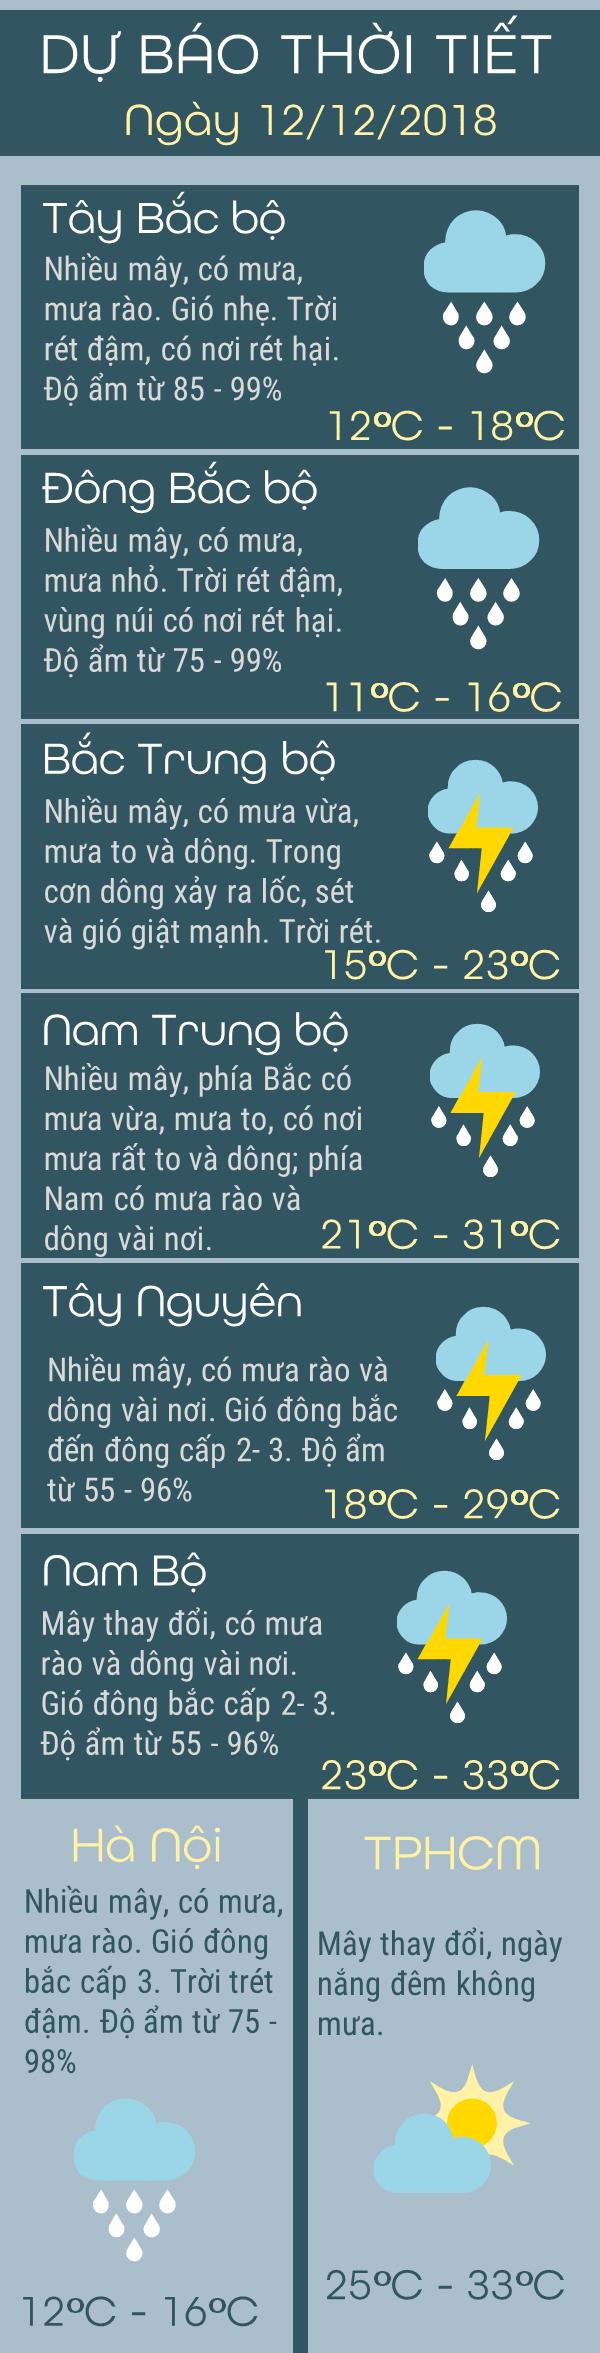 Du-bao-thoi-tiet-hom-nay-12-thang-12